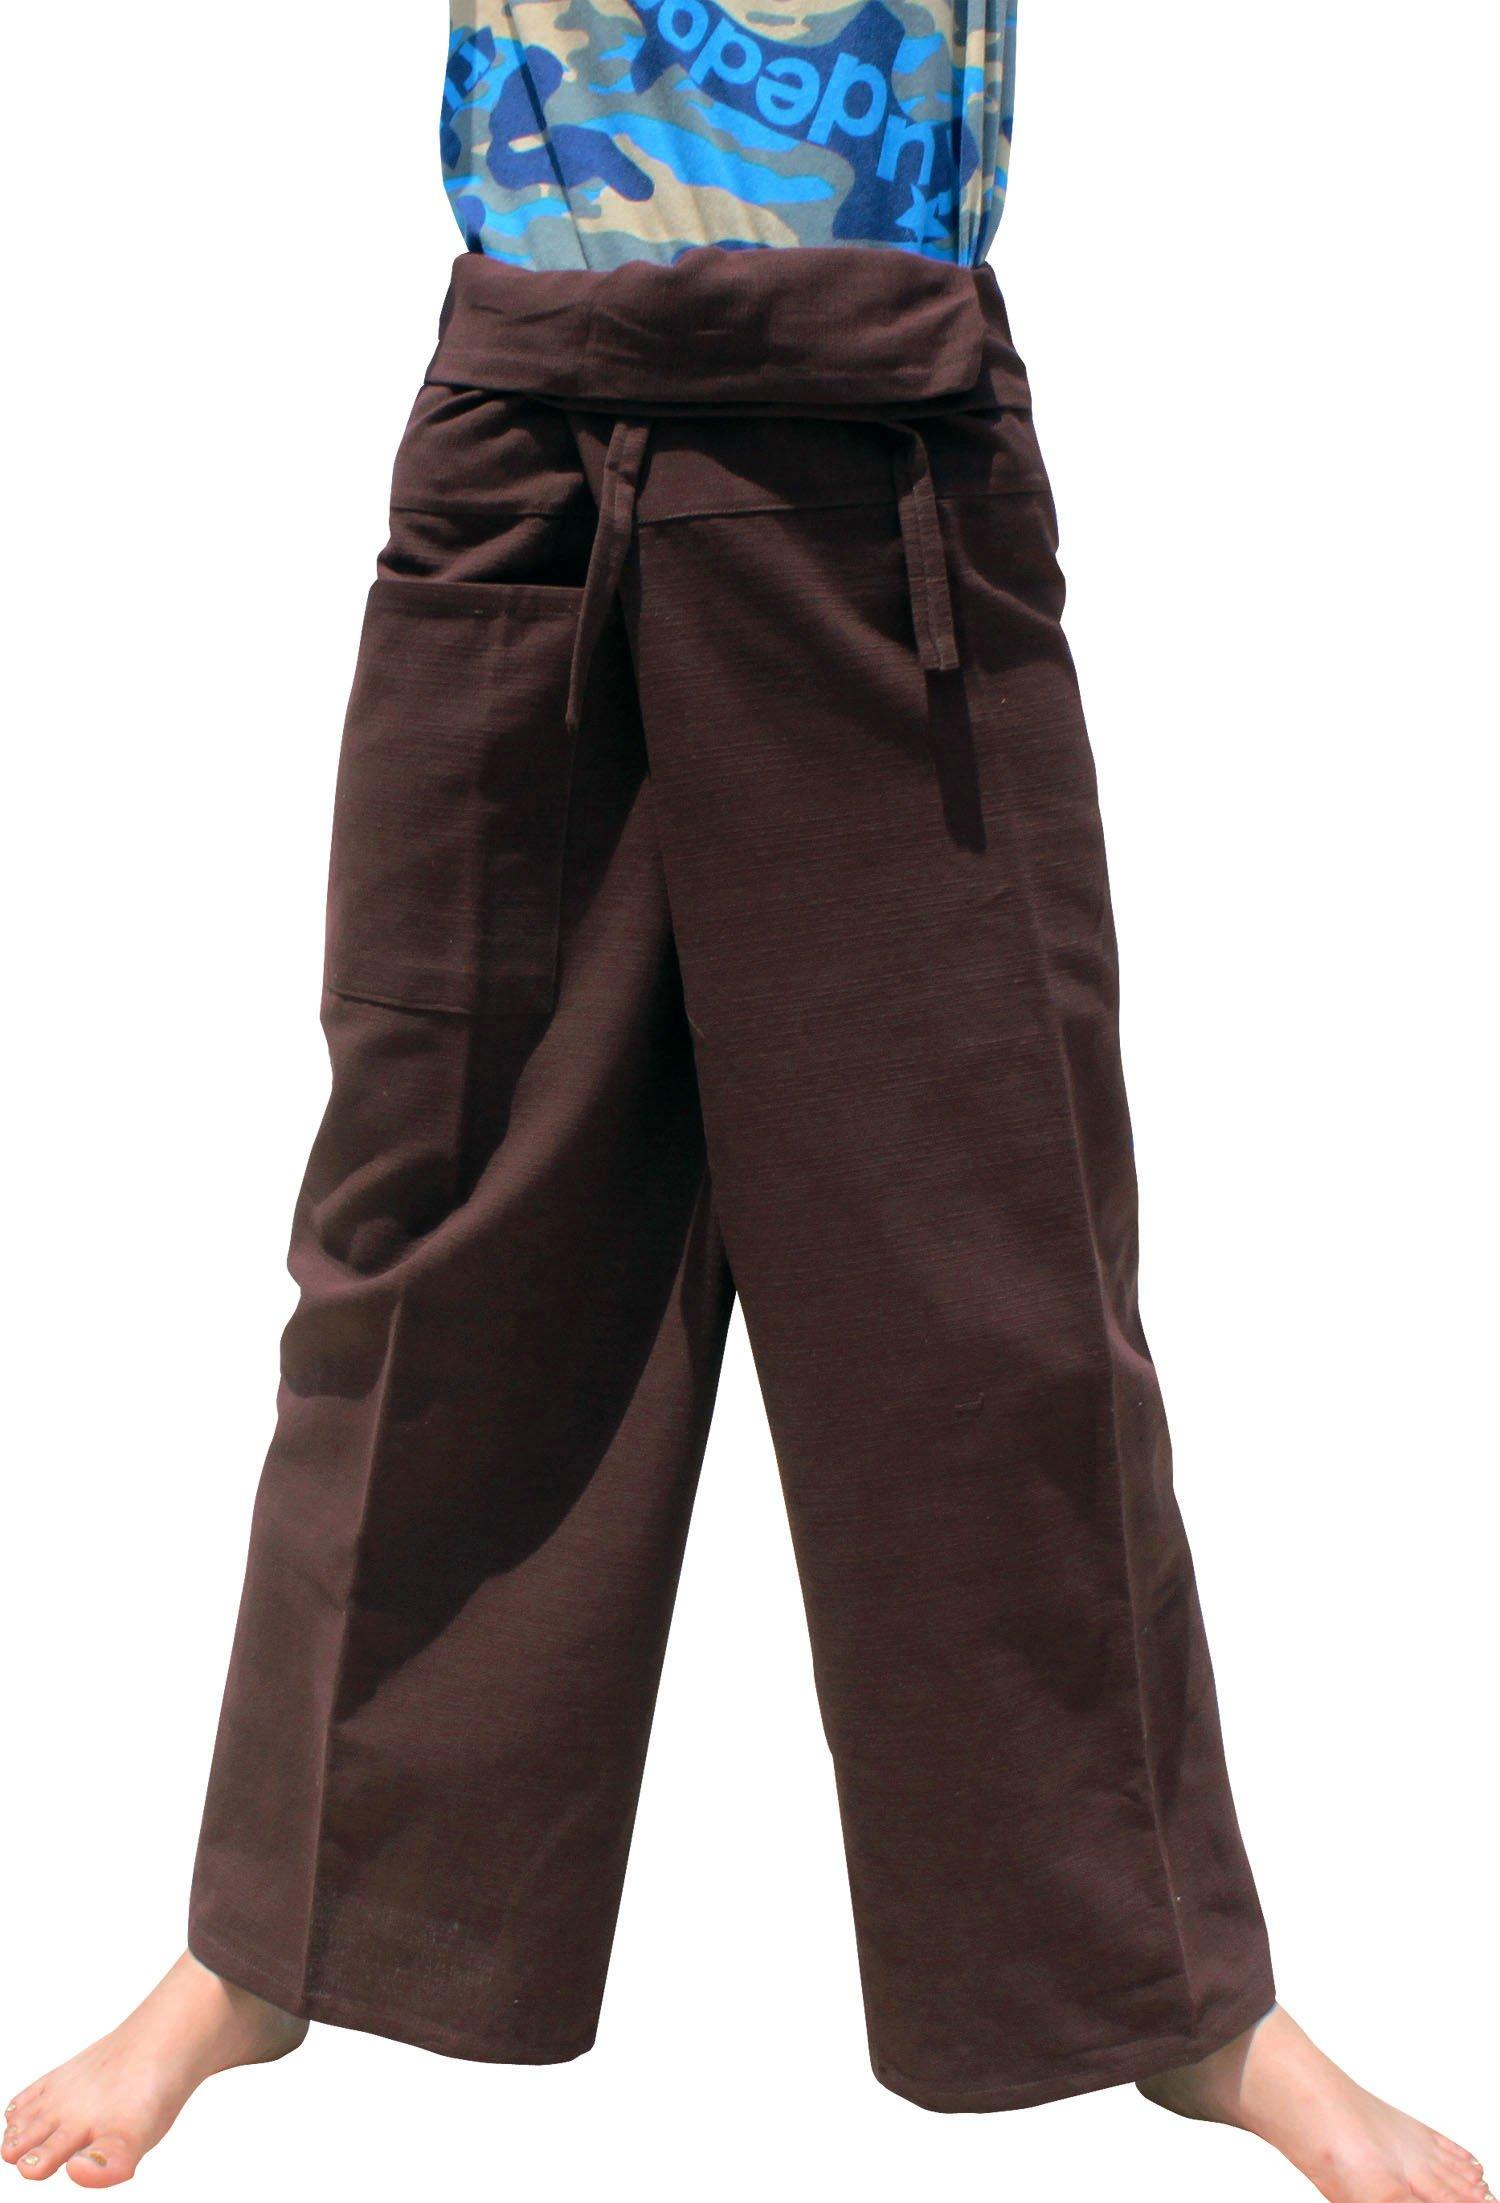 Raan Pah Muang Brand Plain Thick Line Cotton Thai Fisherman Wrap Tall Length Pants, Medium, Dark Sienna Brown by Raan Pah Muang